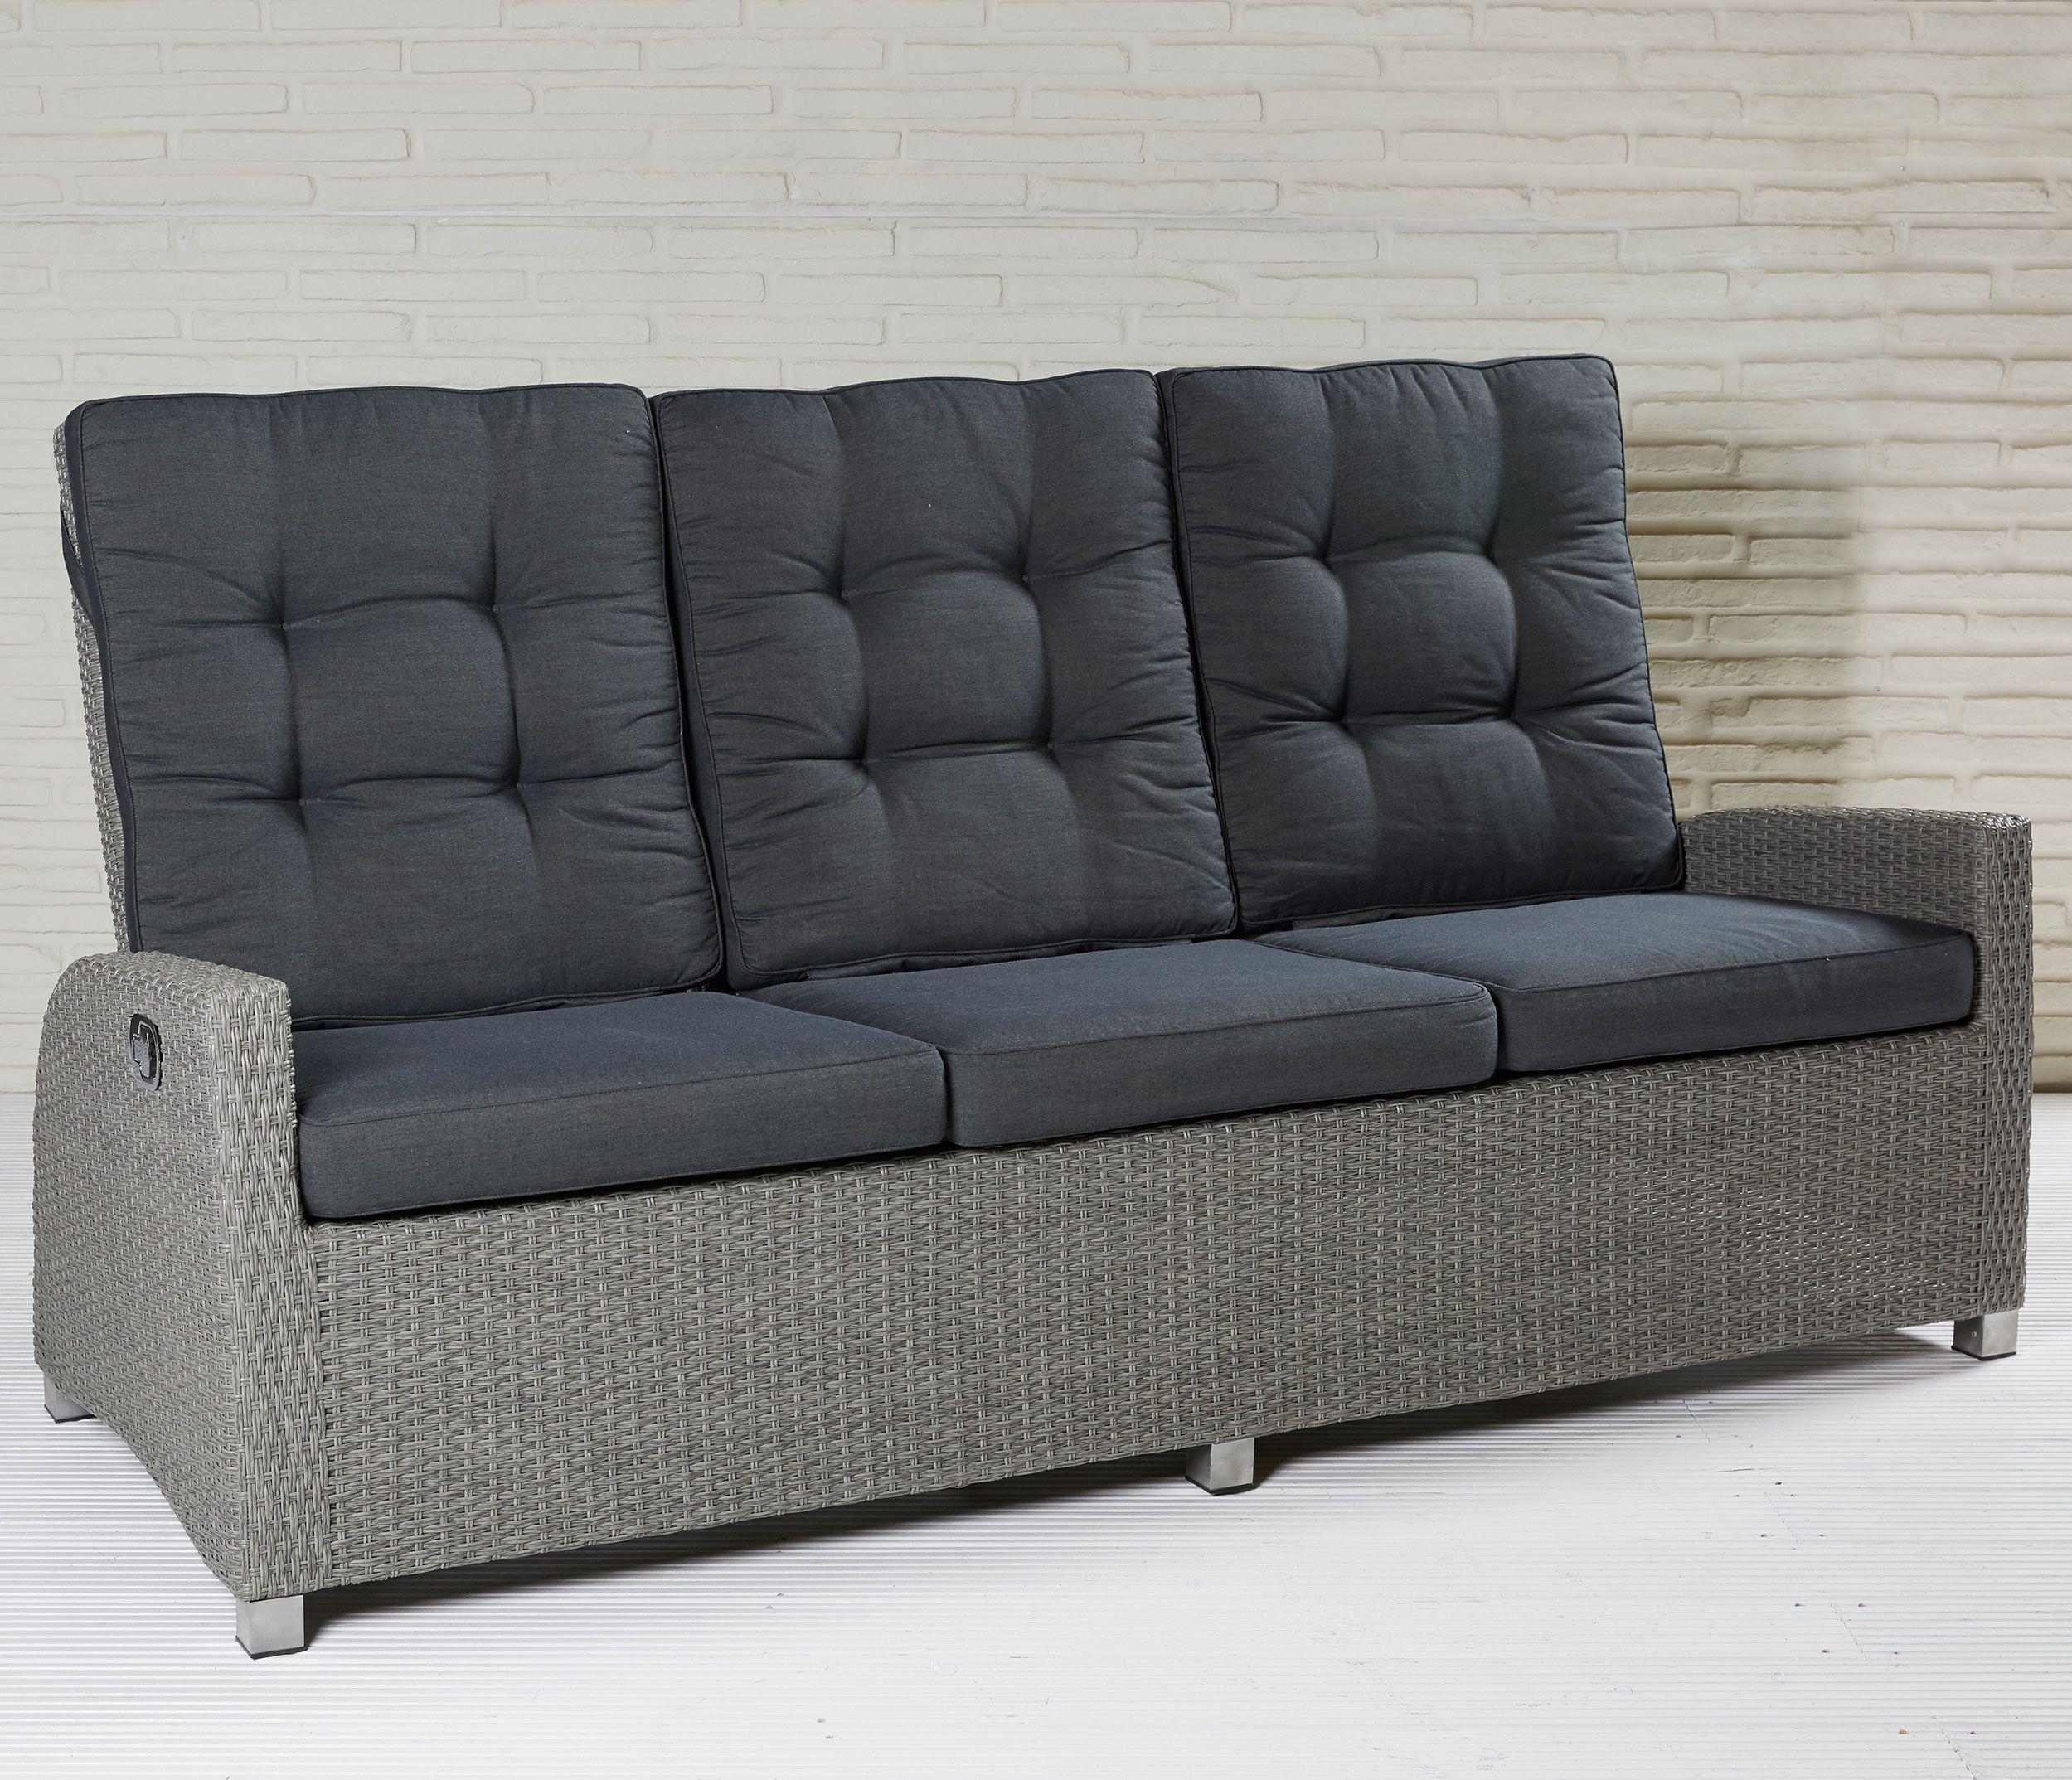 Modesto Living 3er Sofa Mit Polsterauflagen In Grau Polyrattan Gartenmobel Loungemobel Gartensofa Sofa Sofaverstell 3er Sofa Lounge Garnitur Gartenmobel